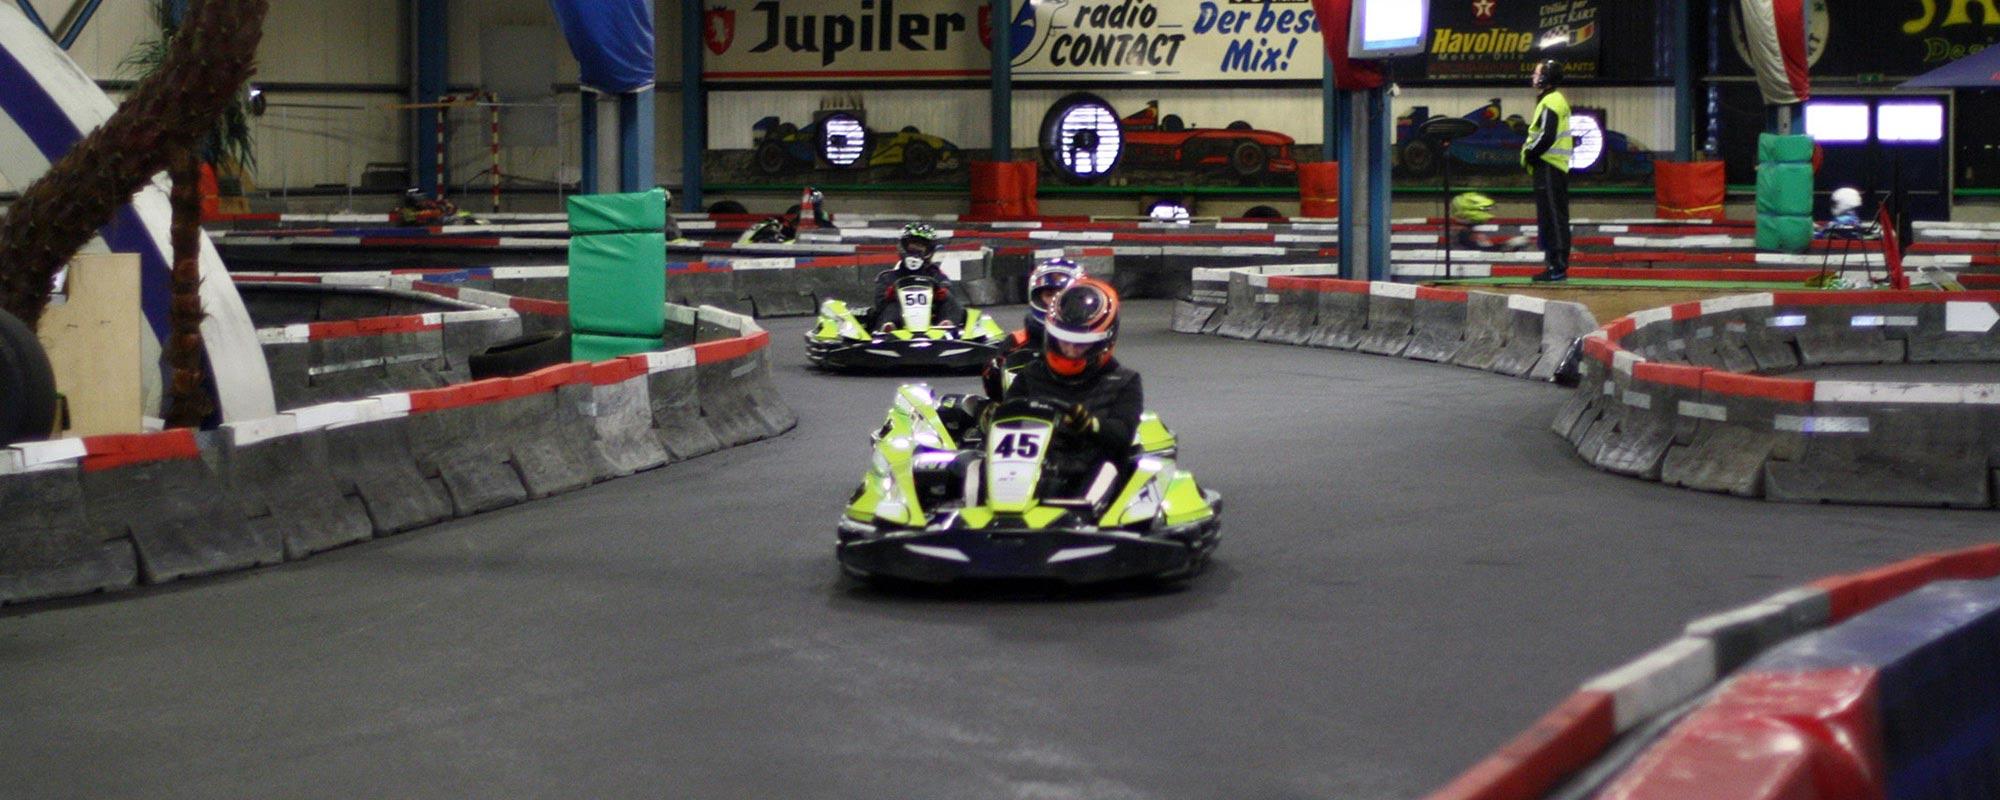 ebafkc-karting-2000x800-11